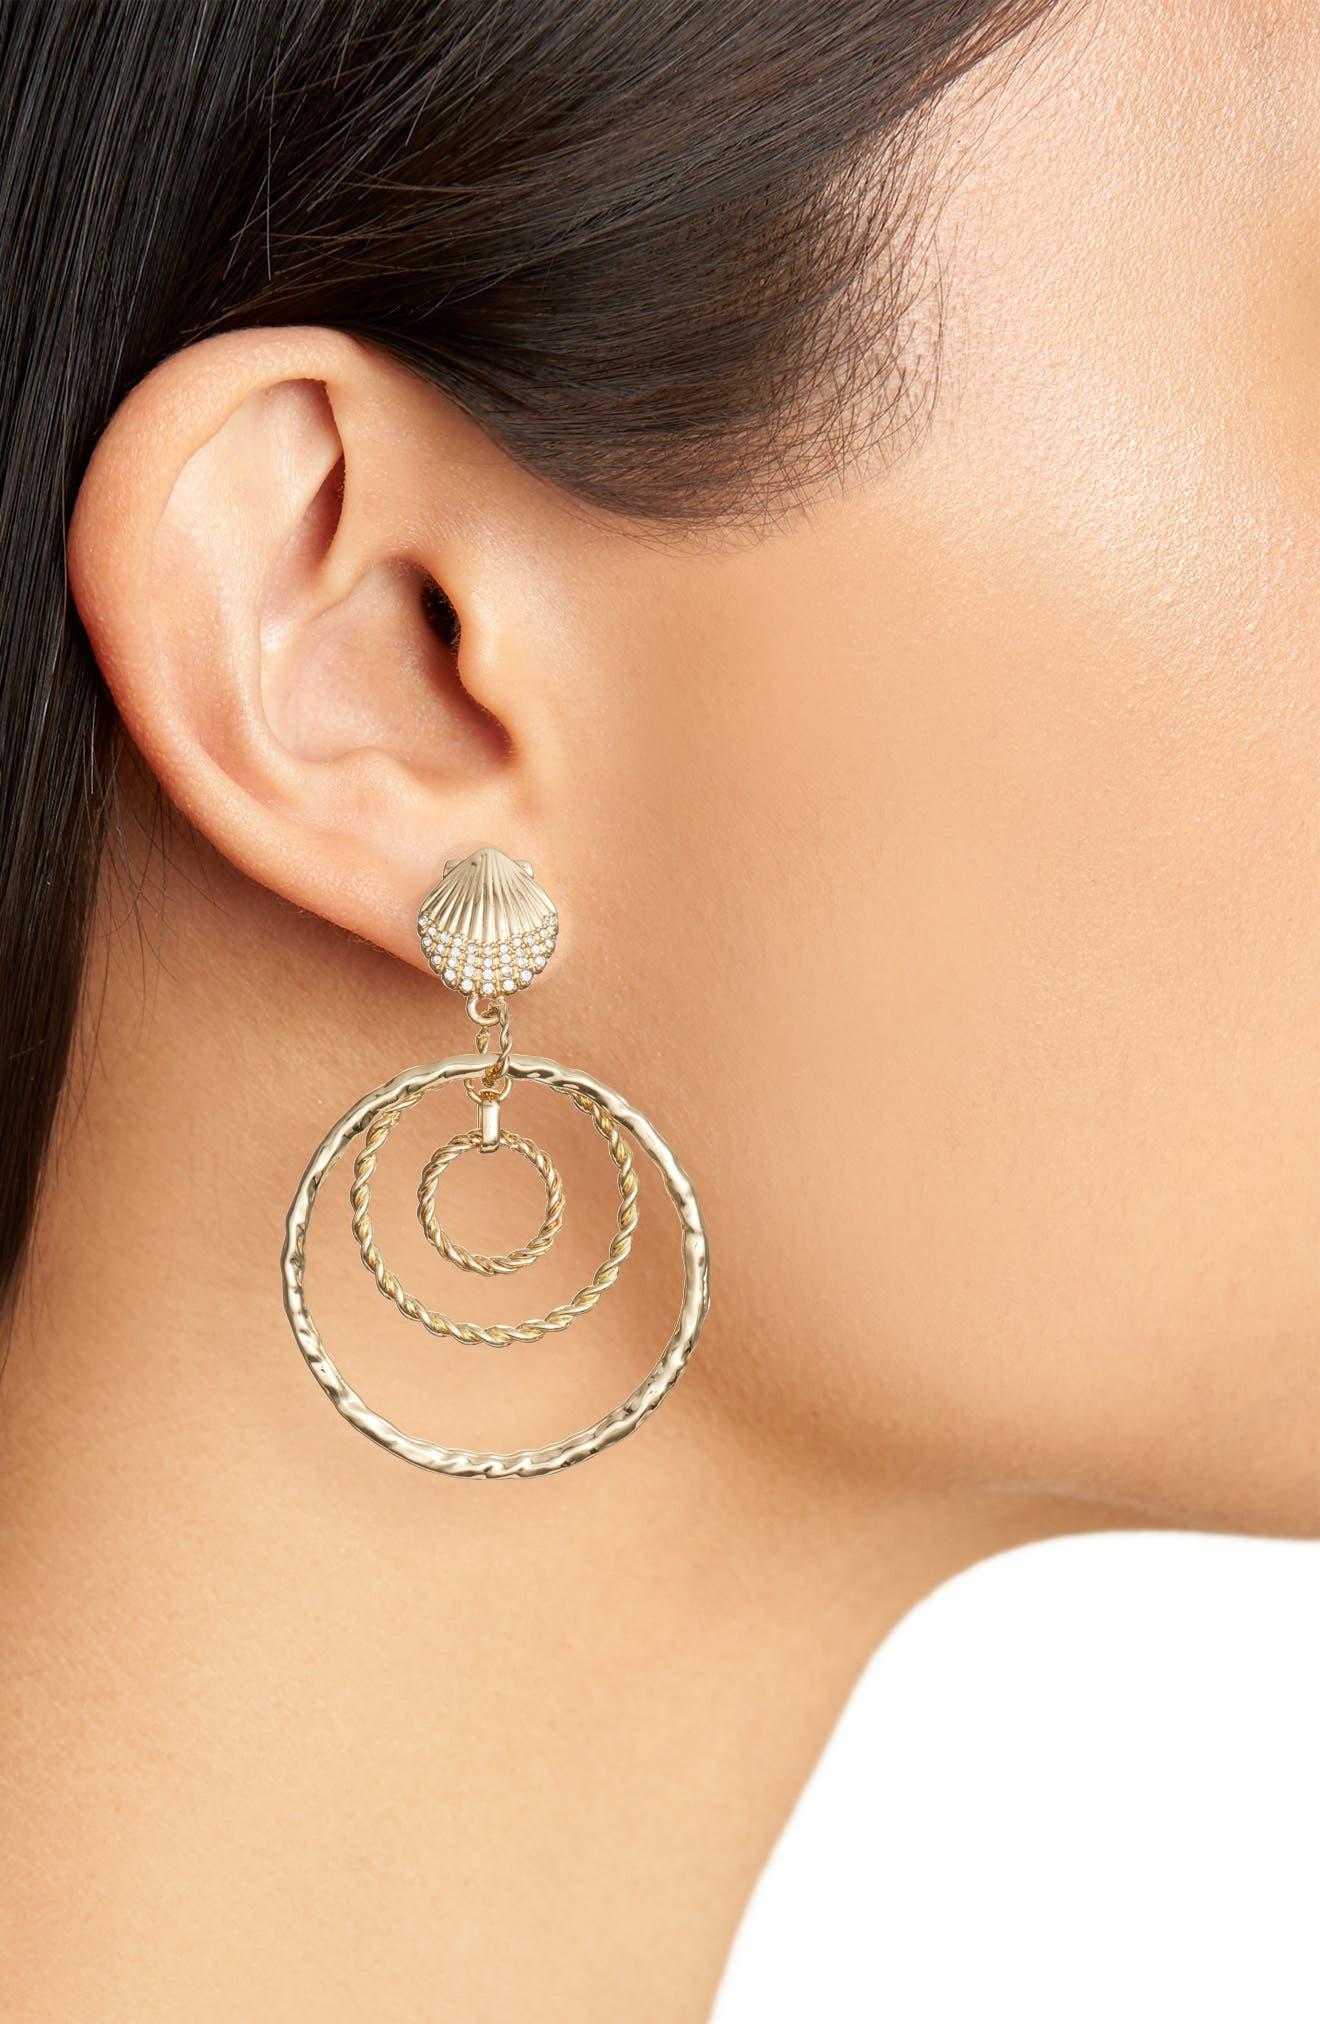 Celestial Seas Hoop Earrings,                             Alternate thumbnail 2, color,                             GOLD METALLIC